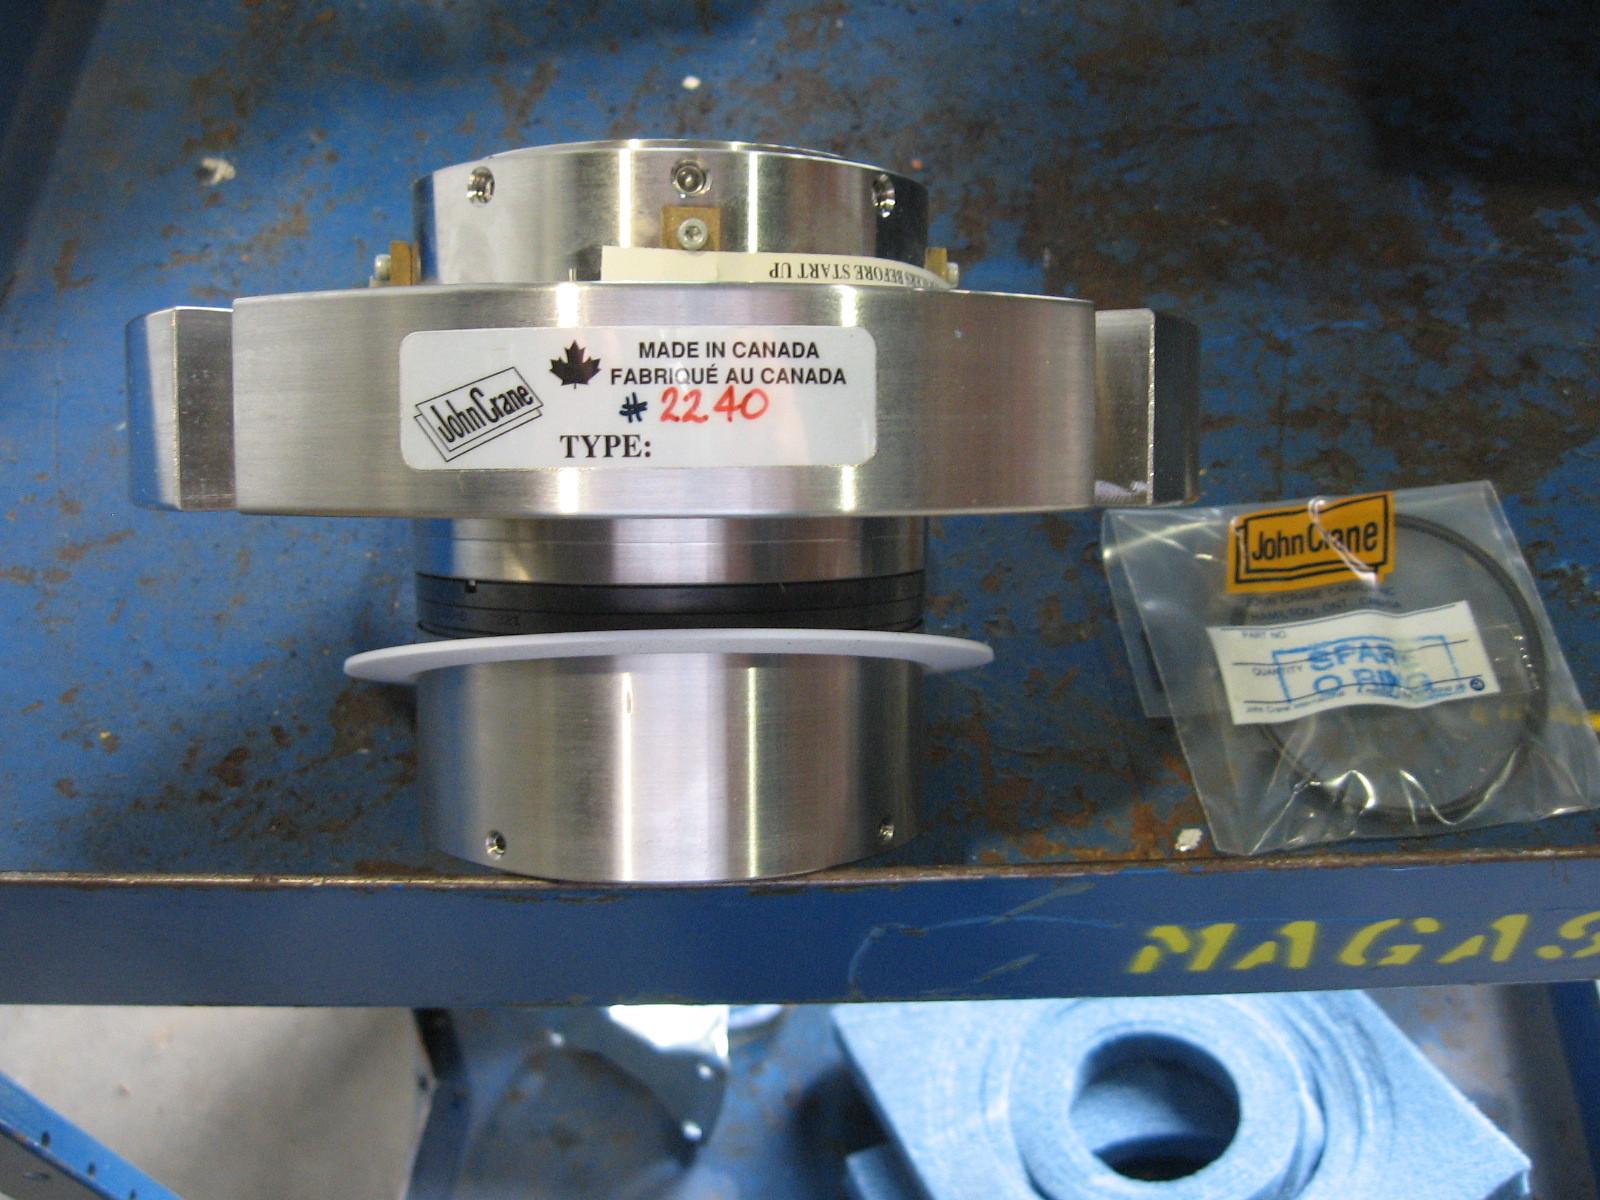 tbfbd mechanical seal fbd mechanical seals manufacturers tbfbd